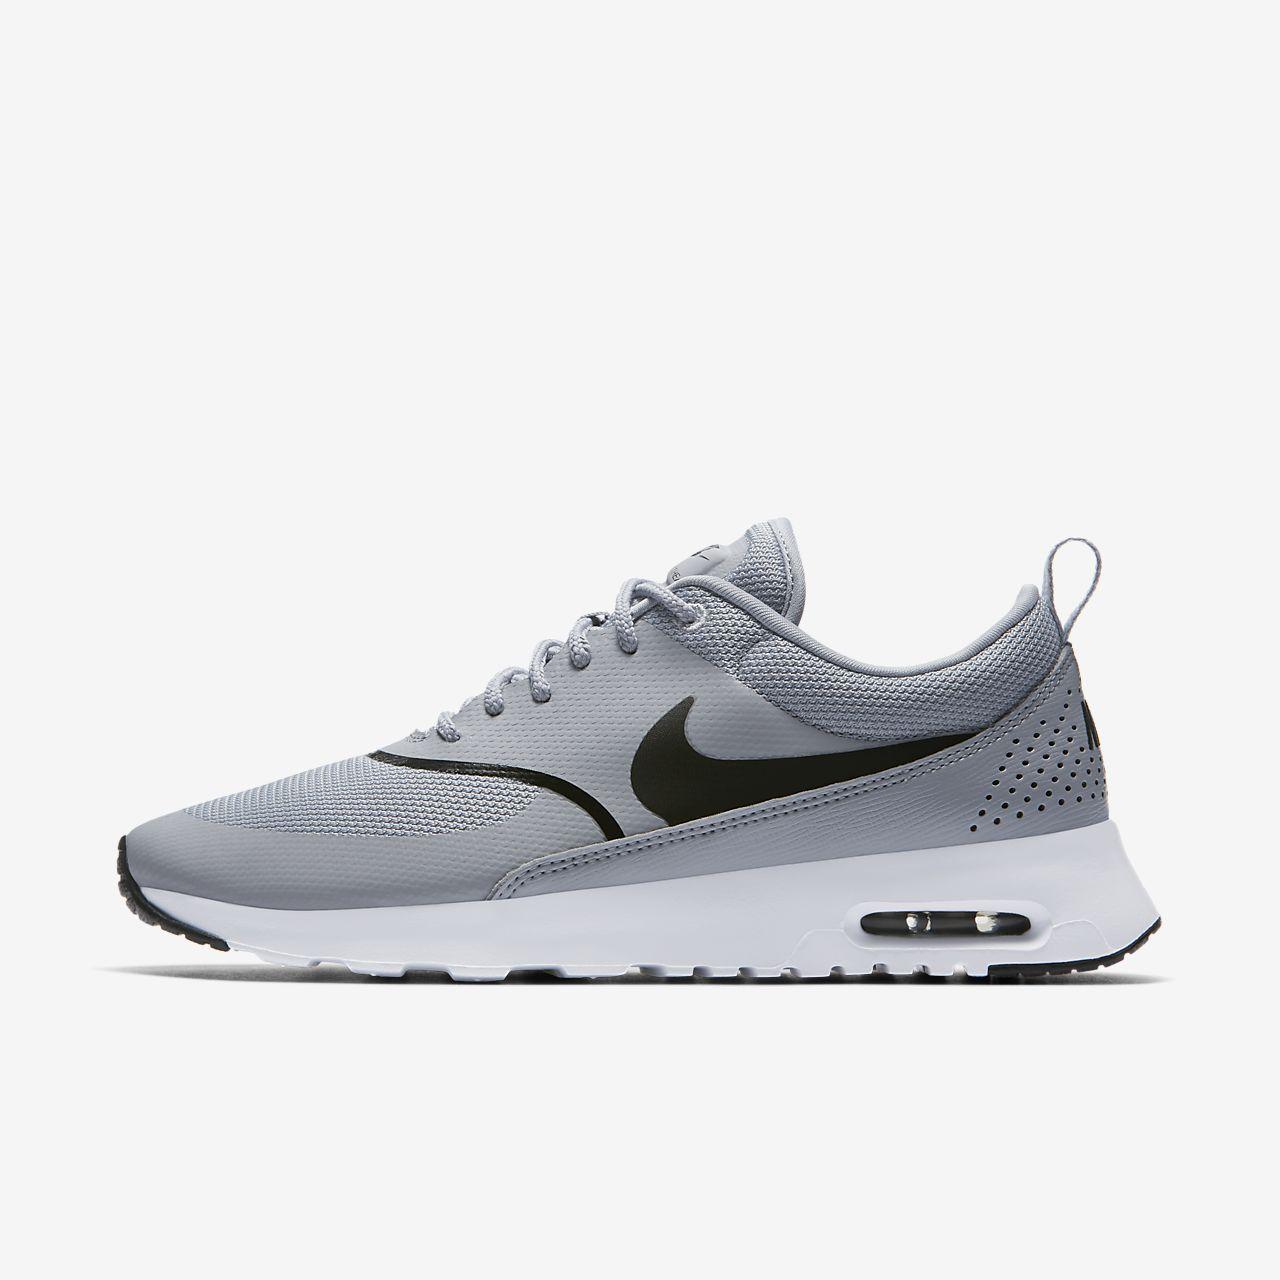 best service 06884 01777 ... Calzado para mujer Nike Air Max Thea